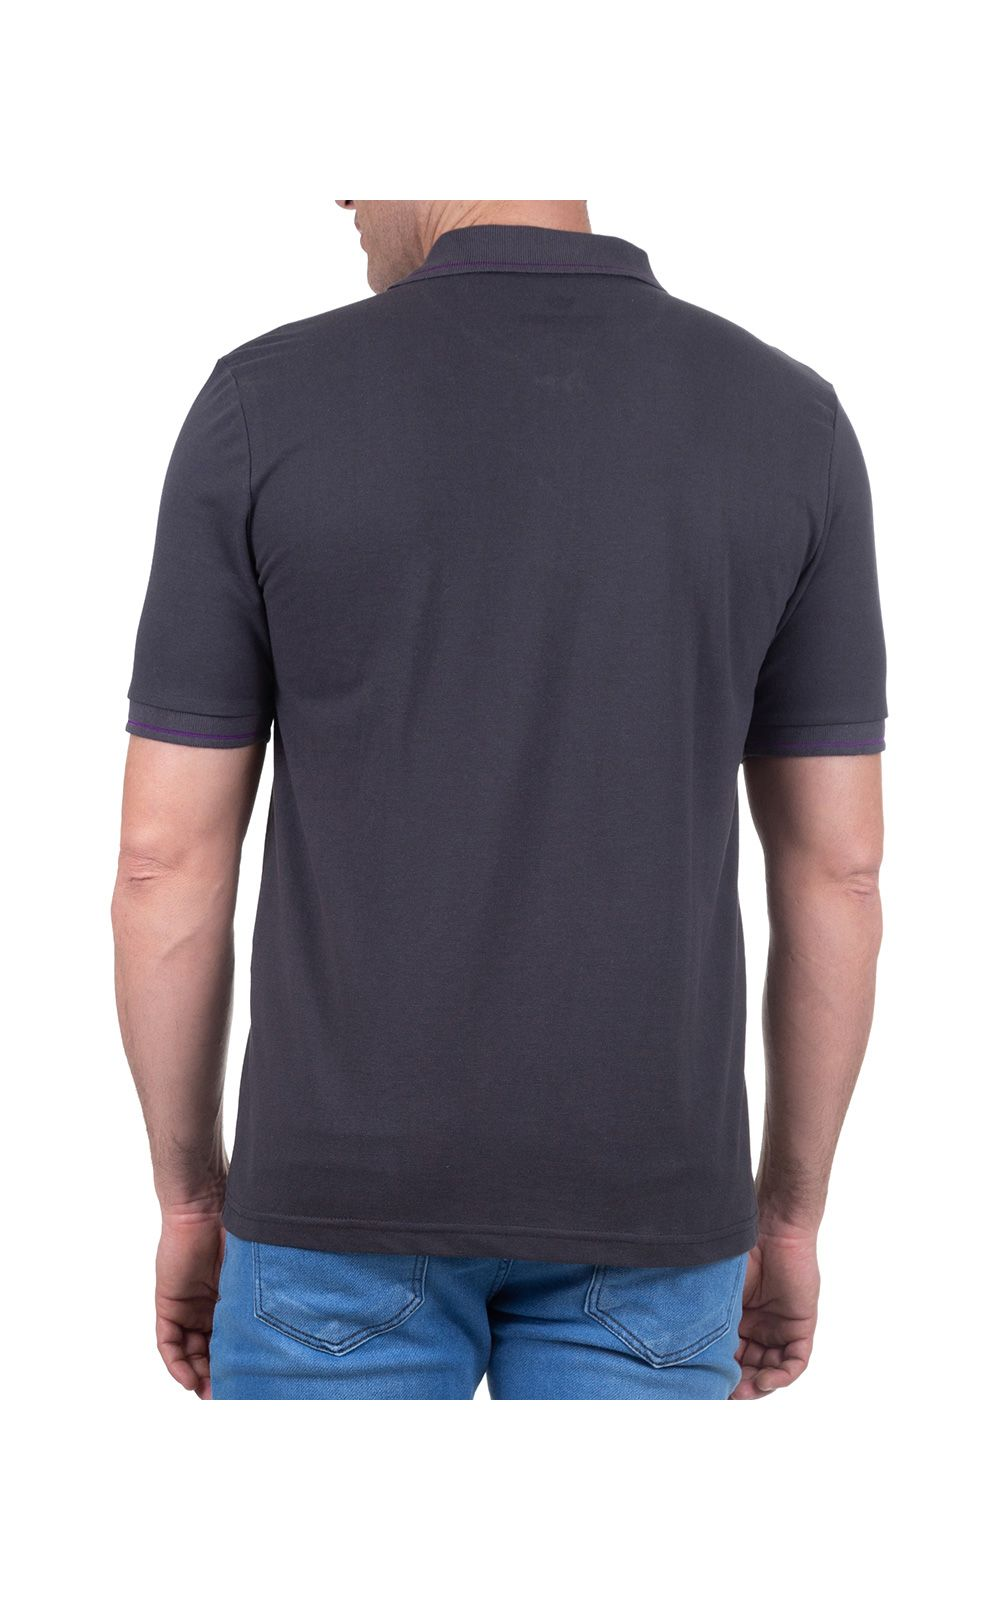 Foto 2 - Camisa Polo Masculina Cinza Escuro Lisa